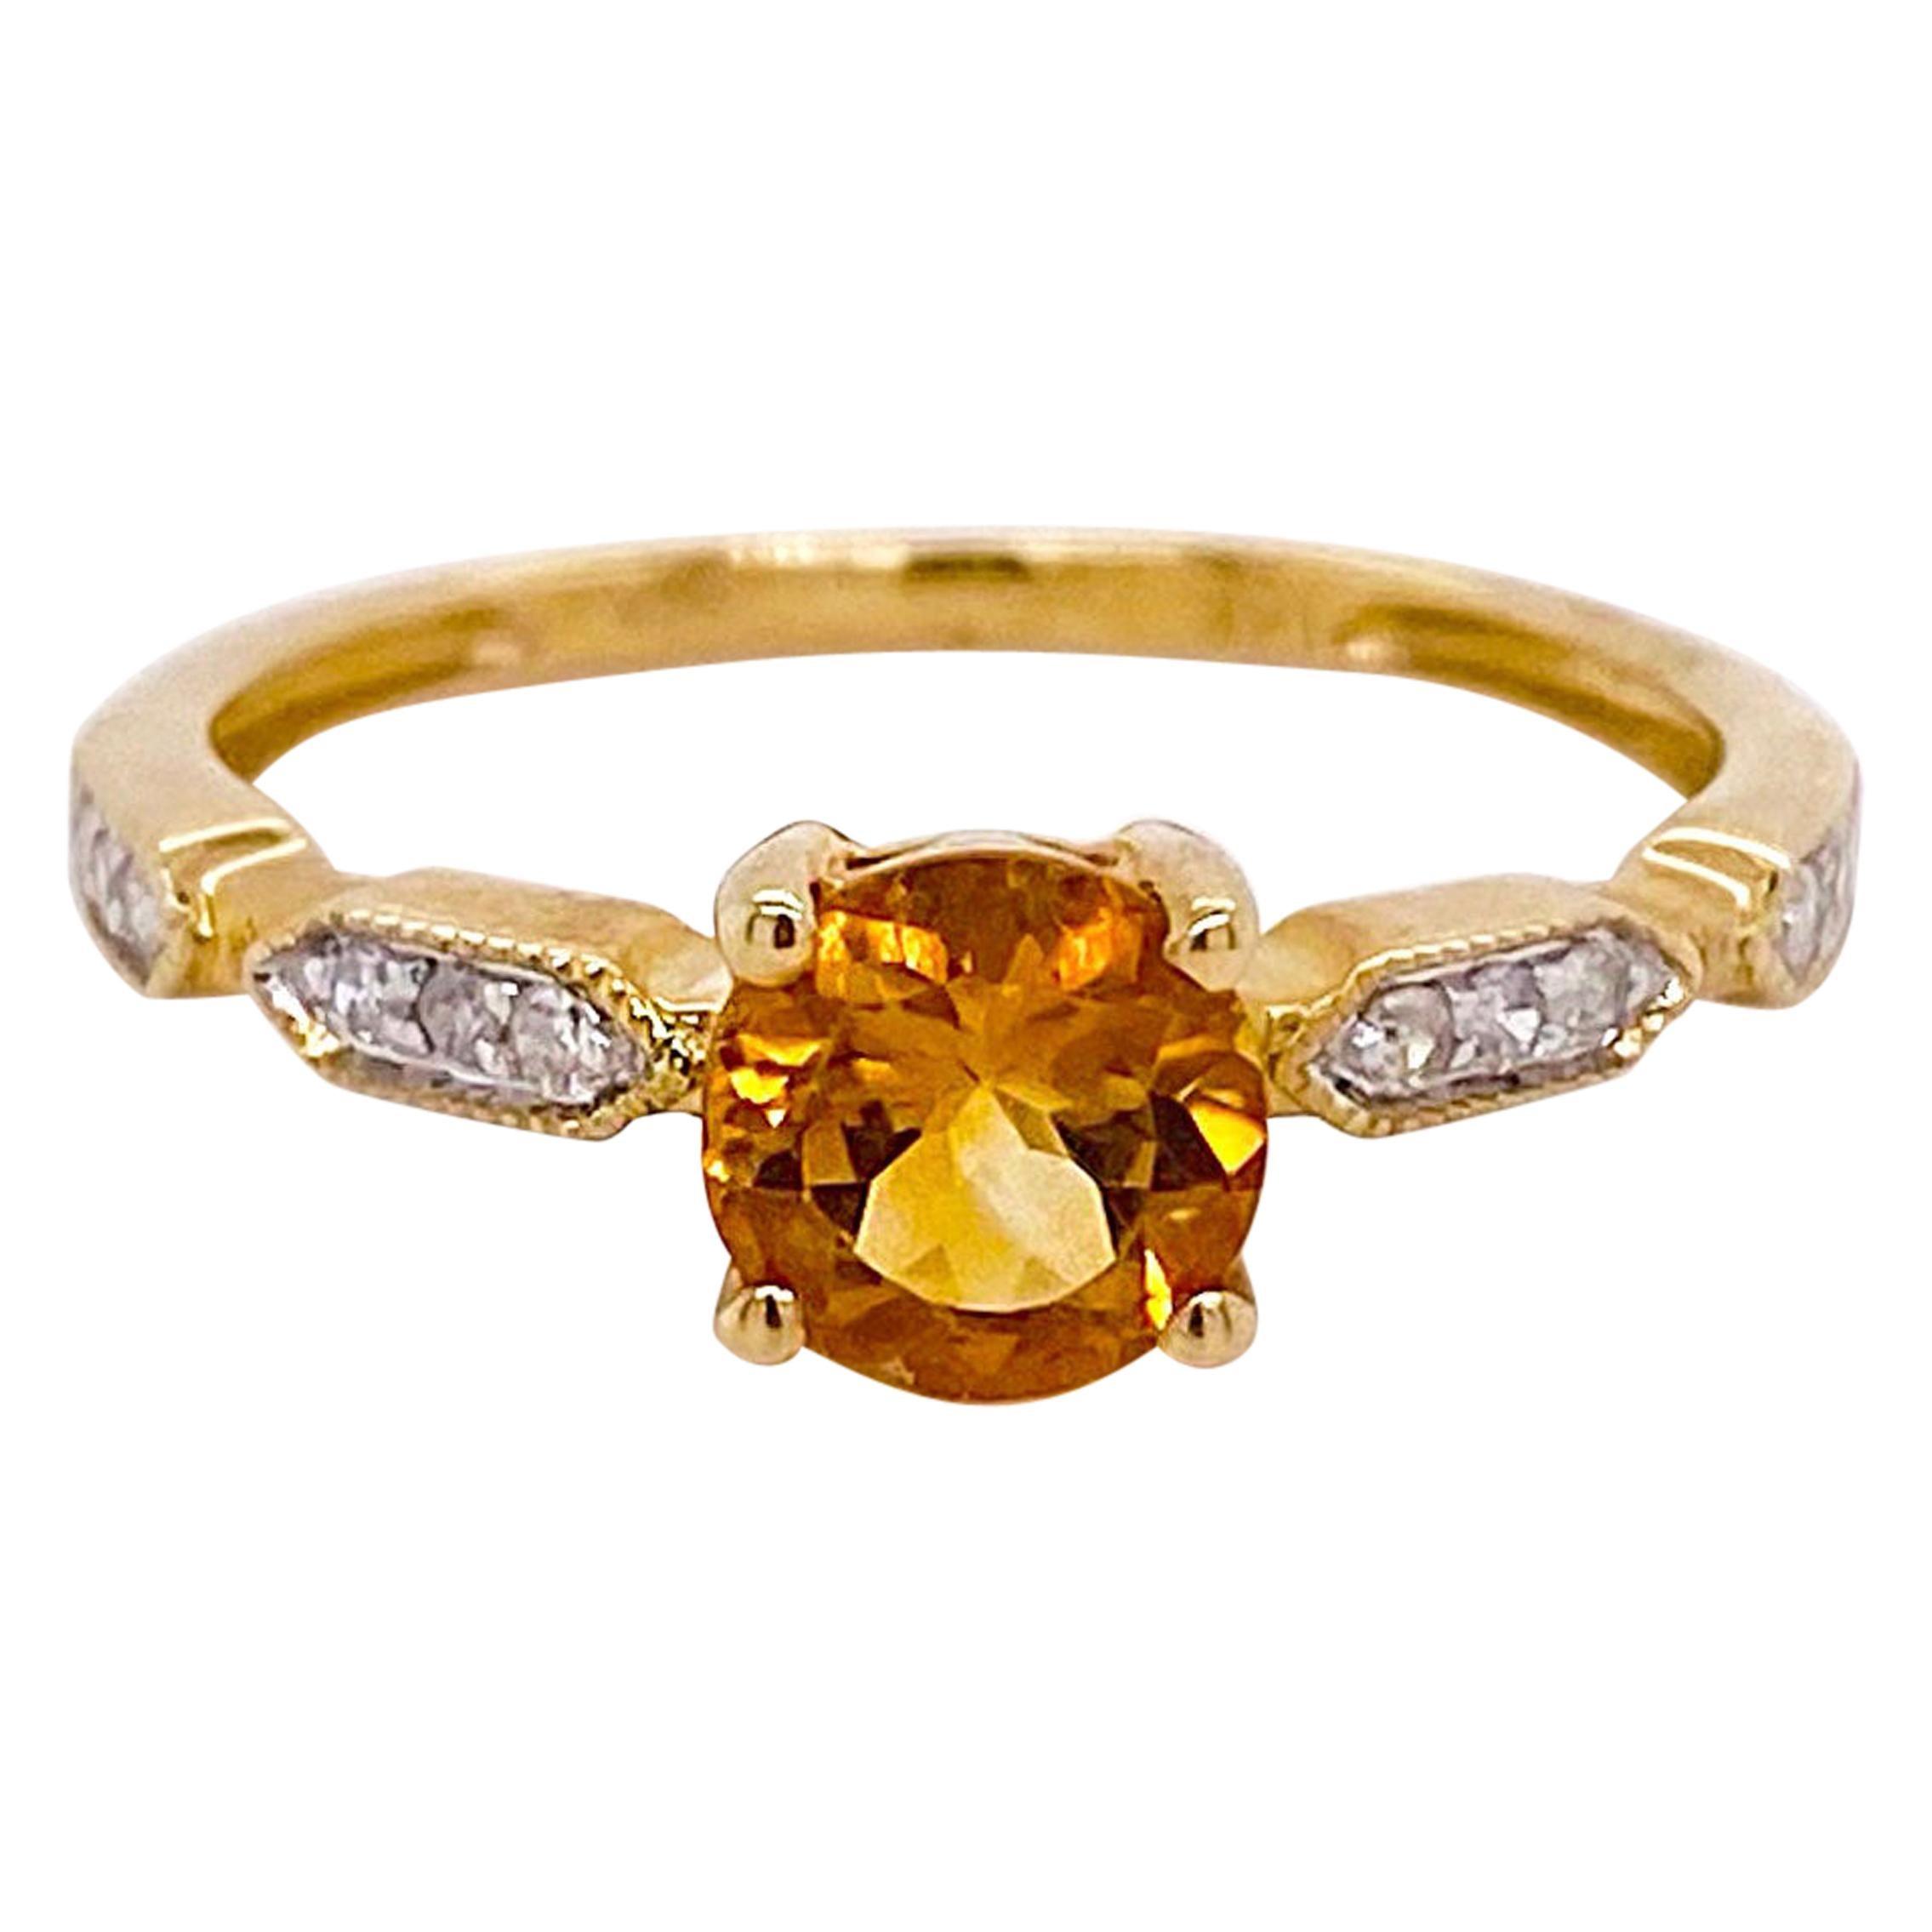 1.00 Carat Citrine and Diamond Ring 14 Karat Yellow Gold Ring November